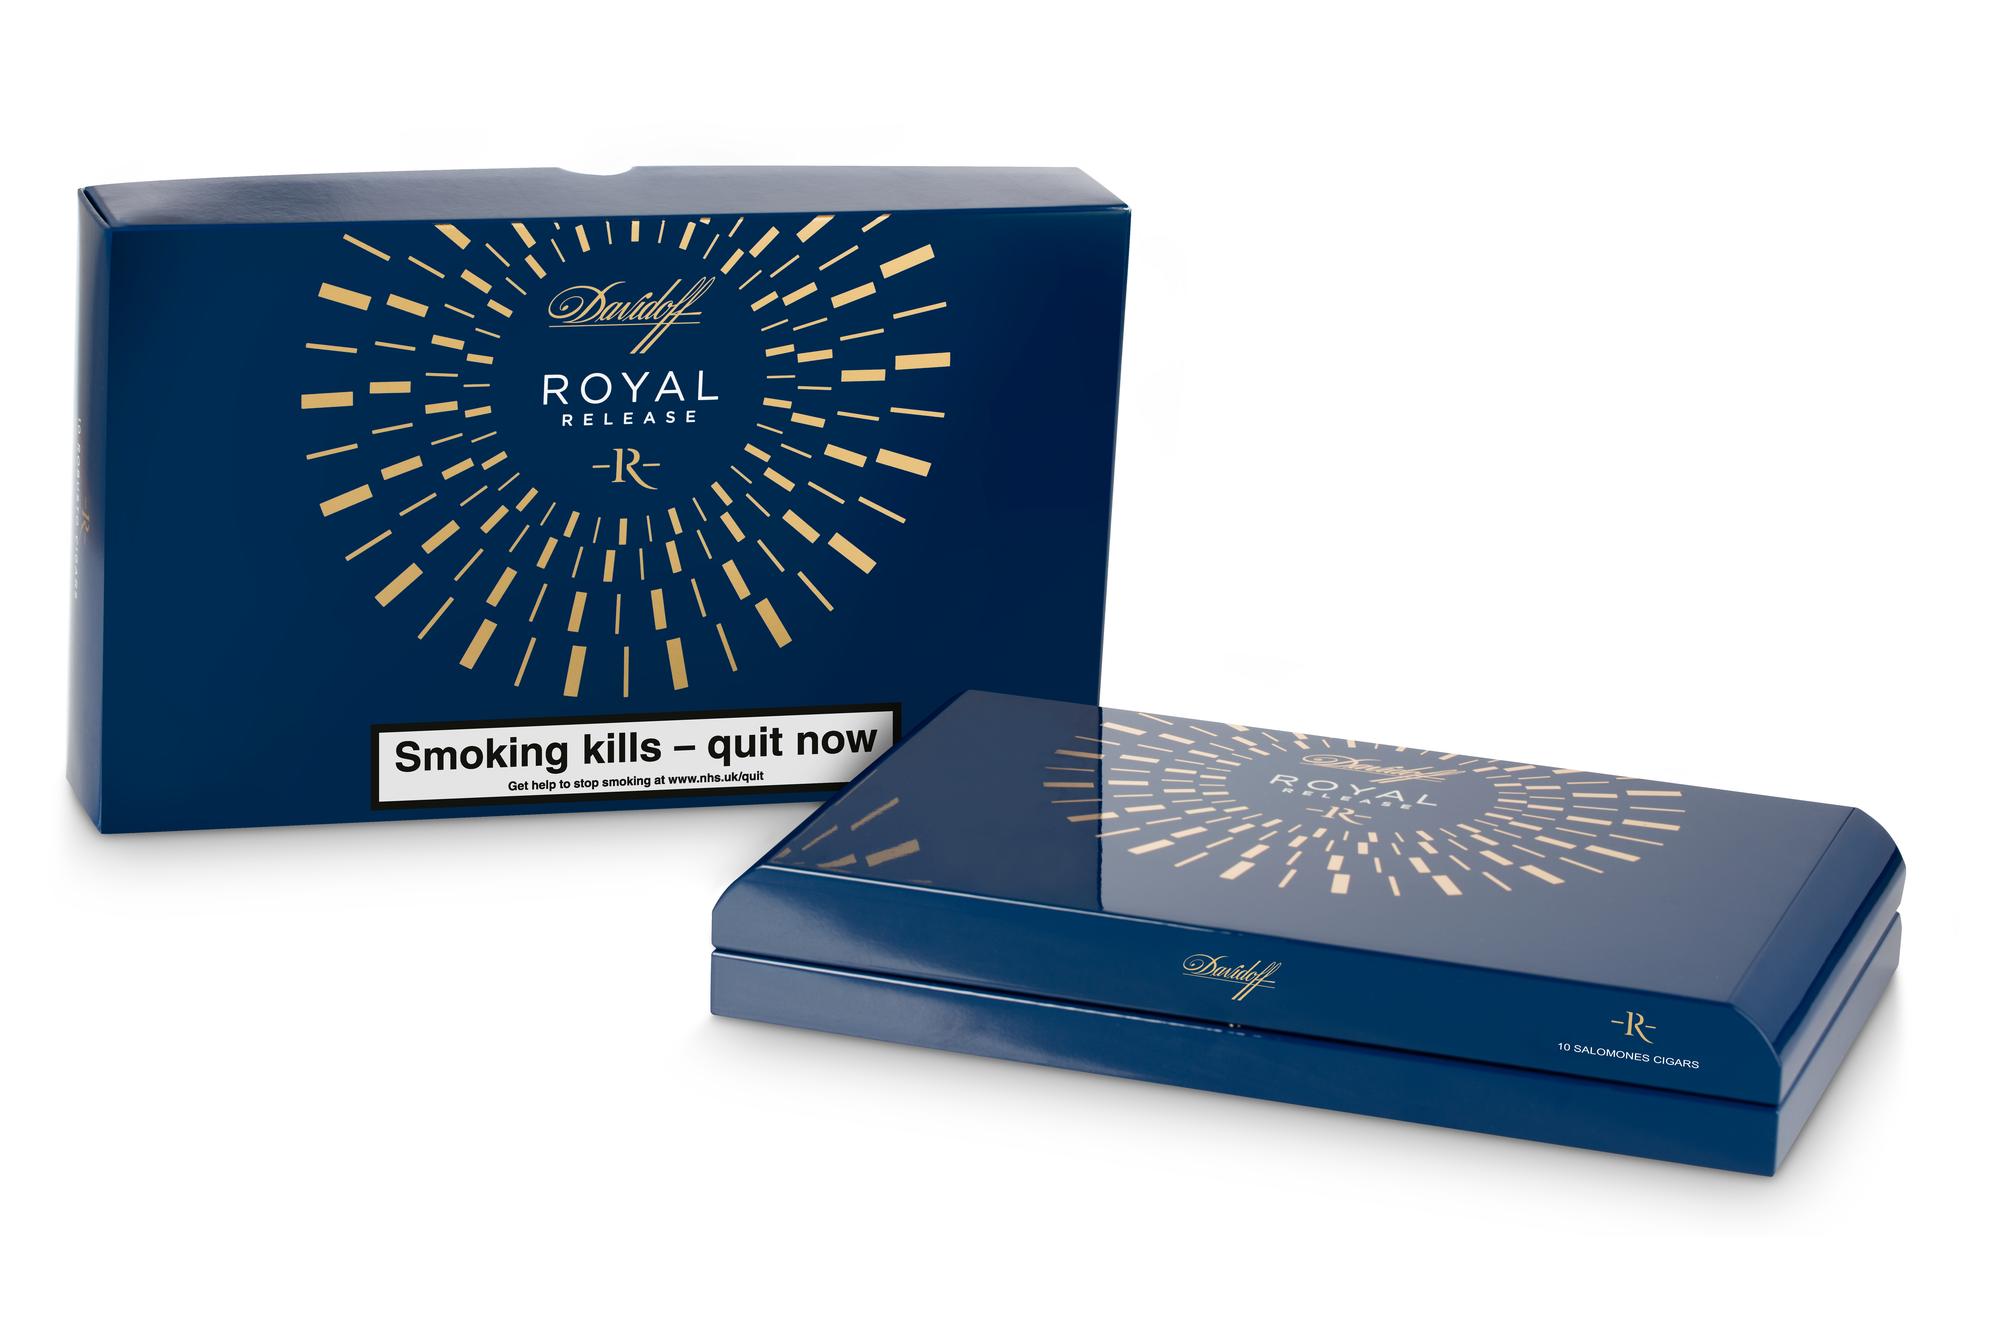 Davidoff Royal Release box